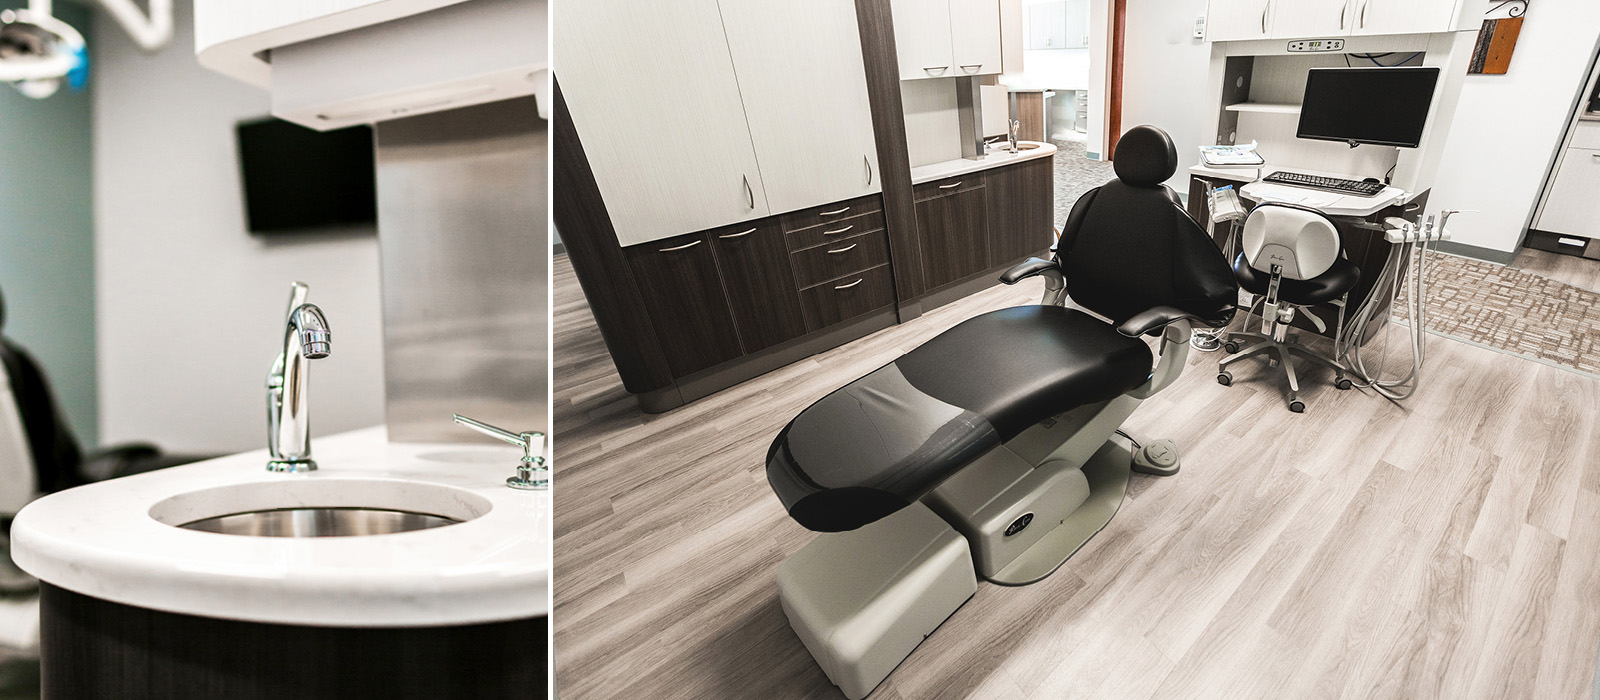 We Care Dental treatment area